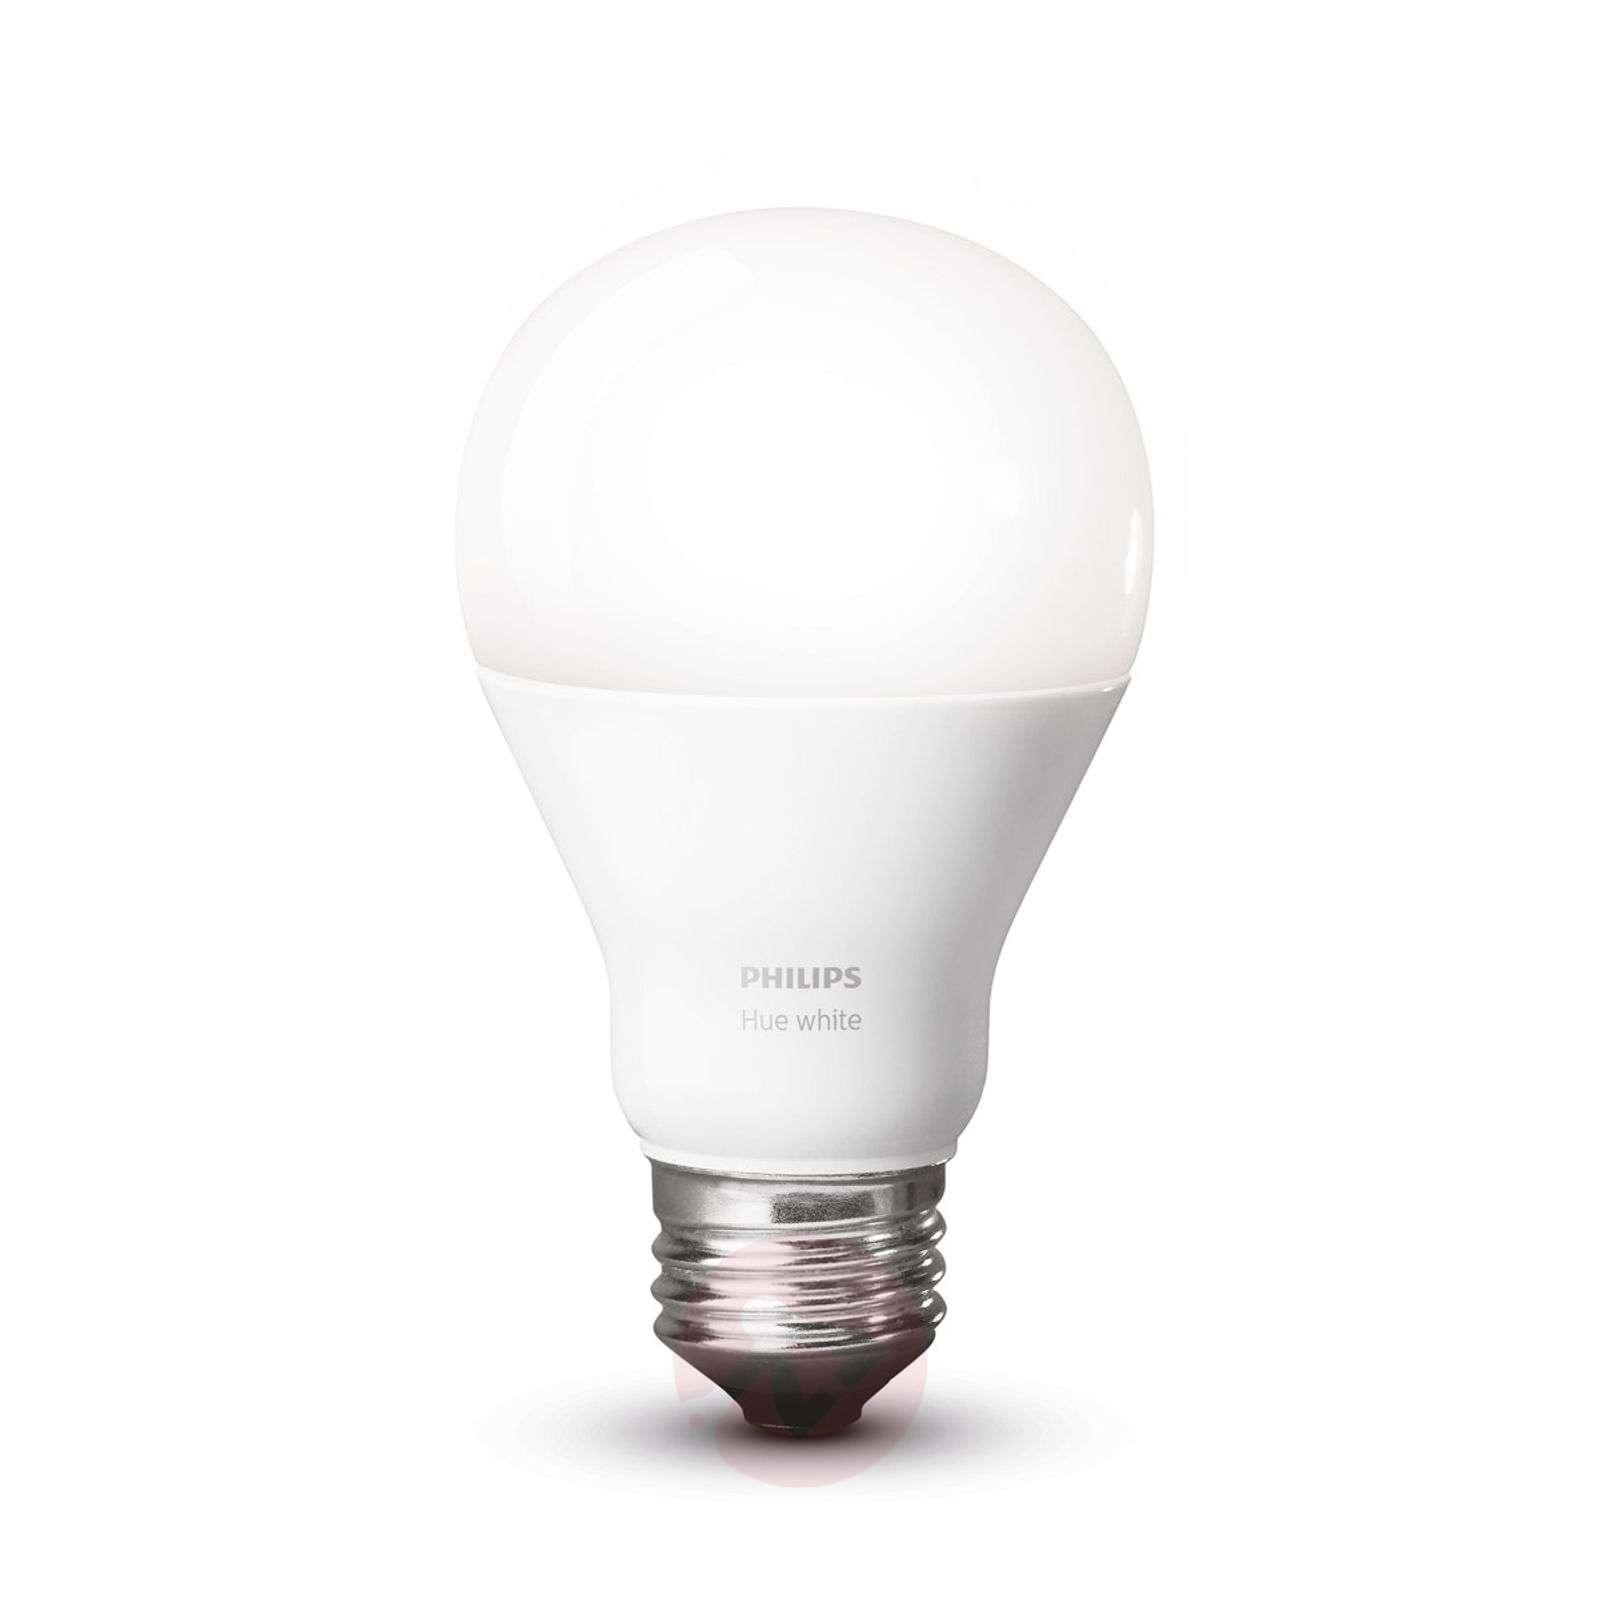 Philips Hue White-lisälamppu 1 x 9,5W E27-7531681-02